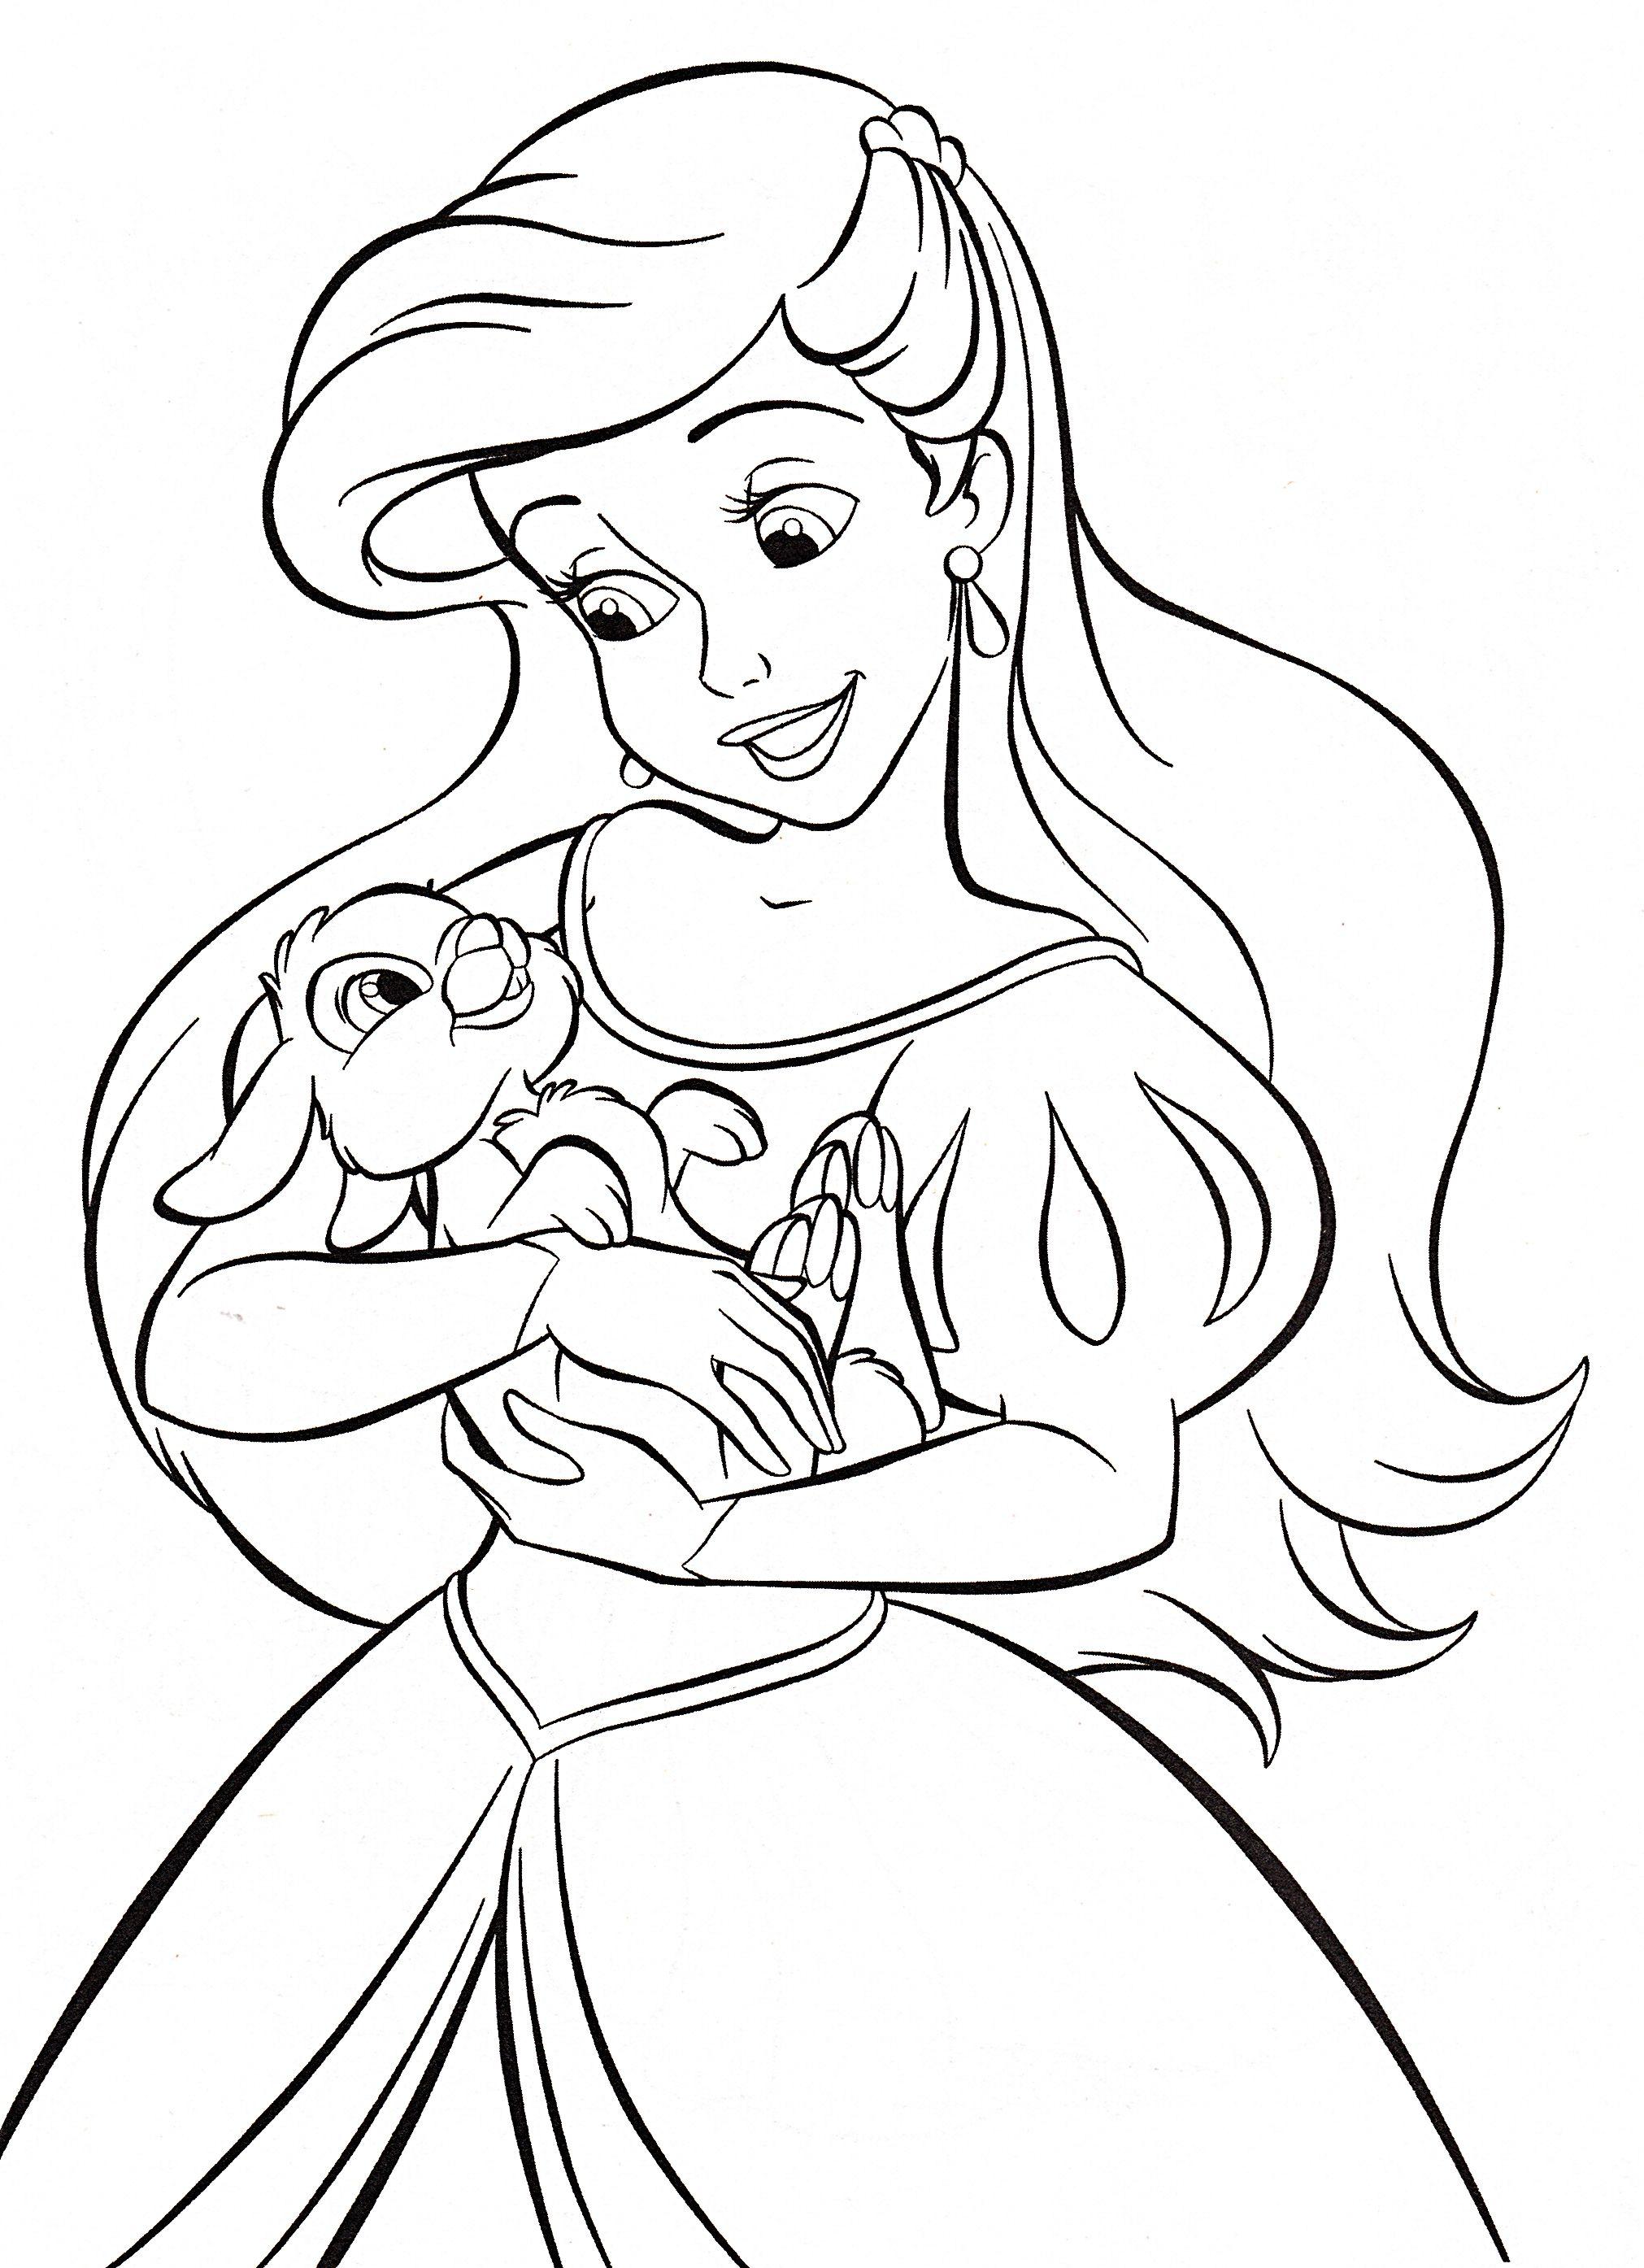 Walt Disney Coloring Pages Princess Ariel Walt Disney ...   ariel princess colouring pages to print